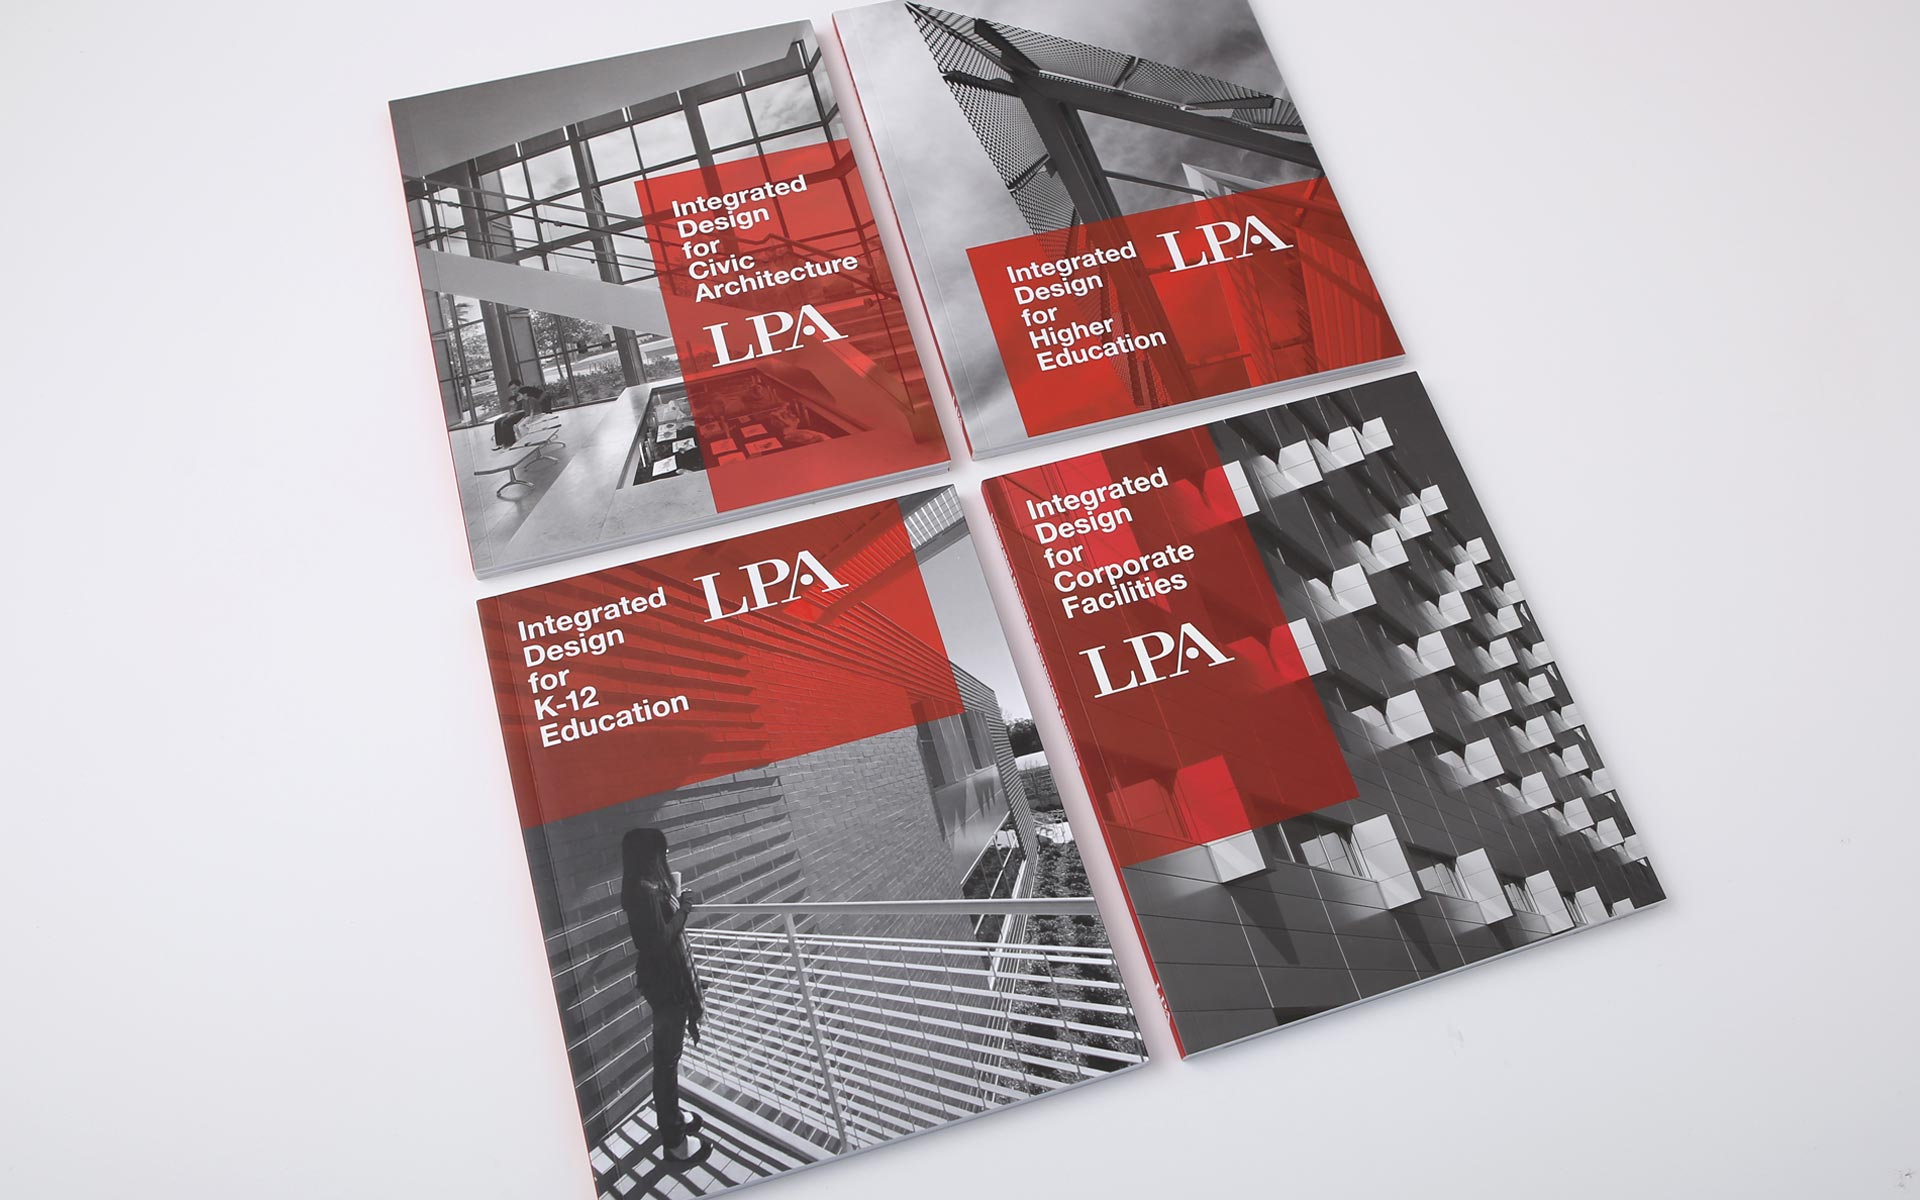 lpa-education-sports-book-design-8